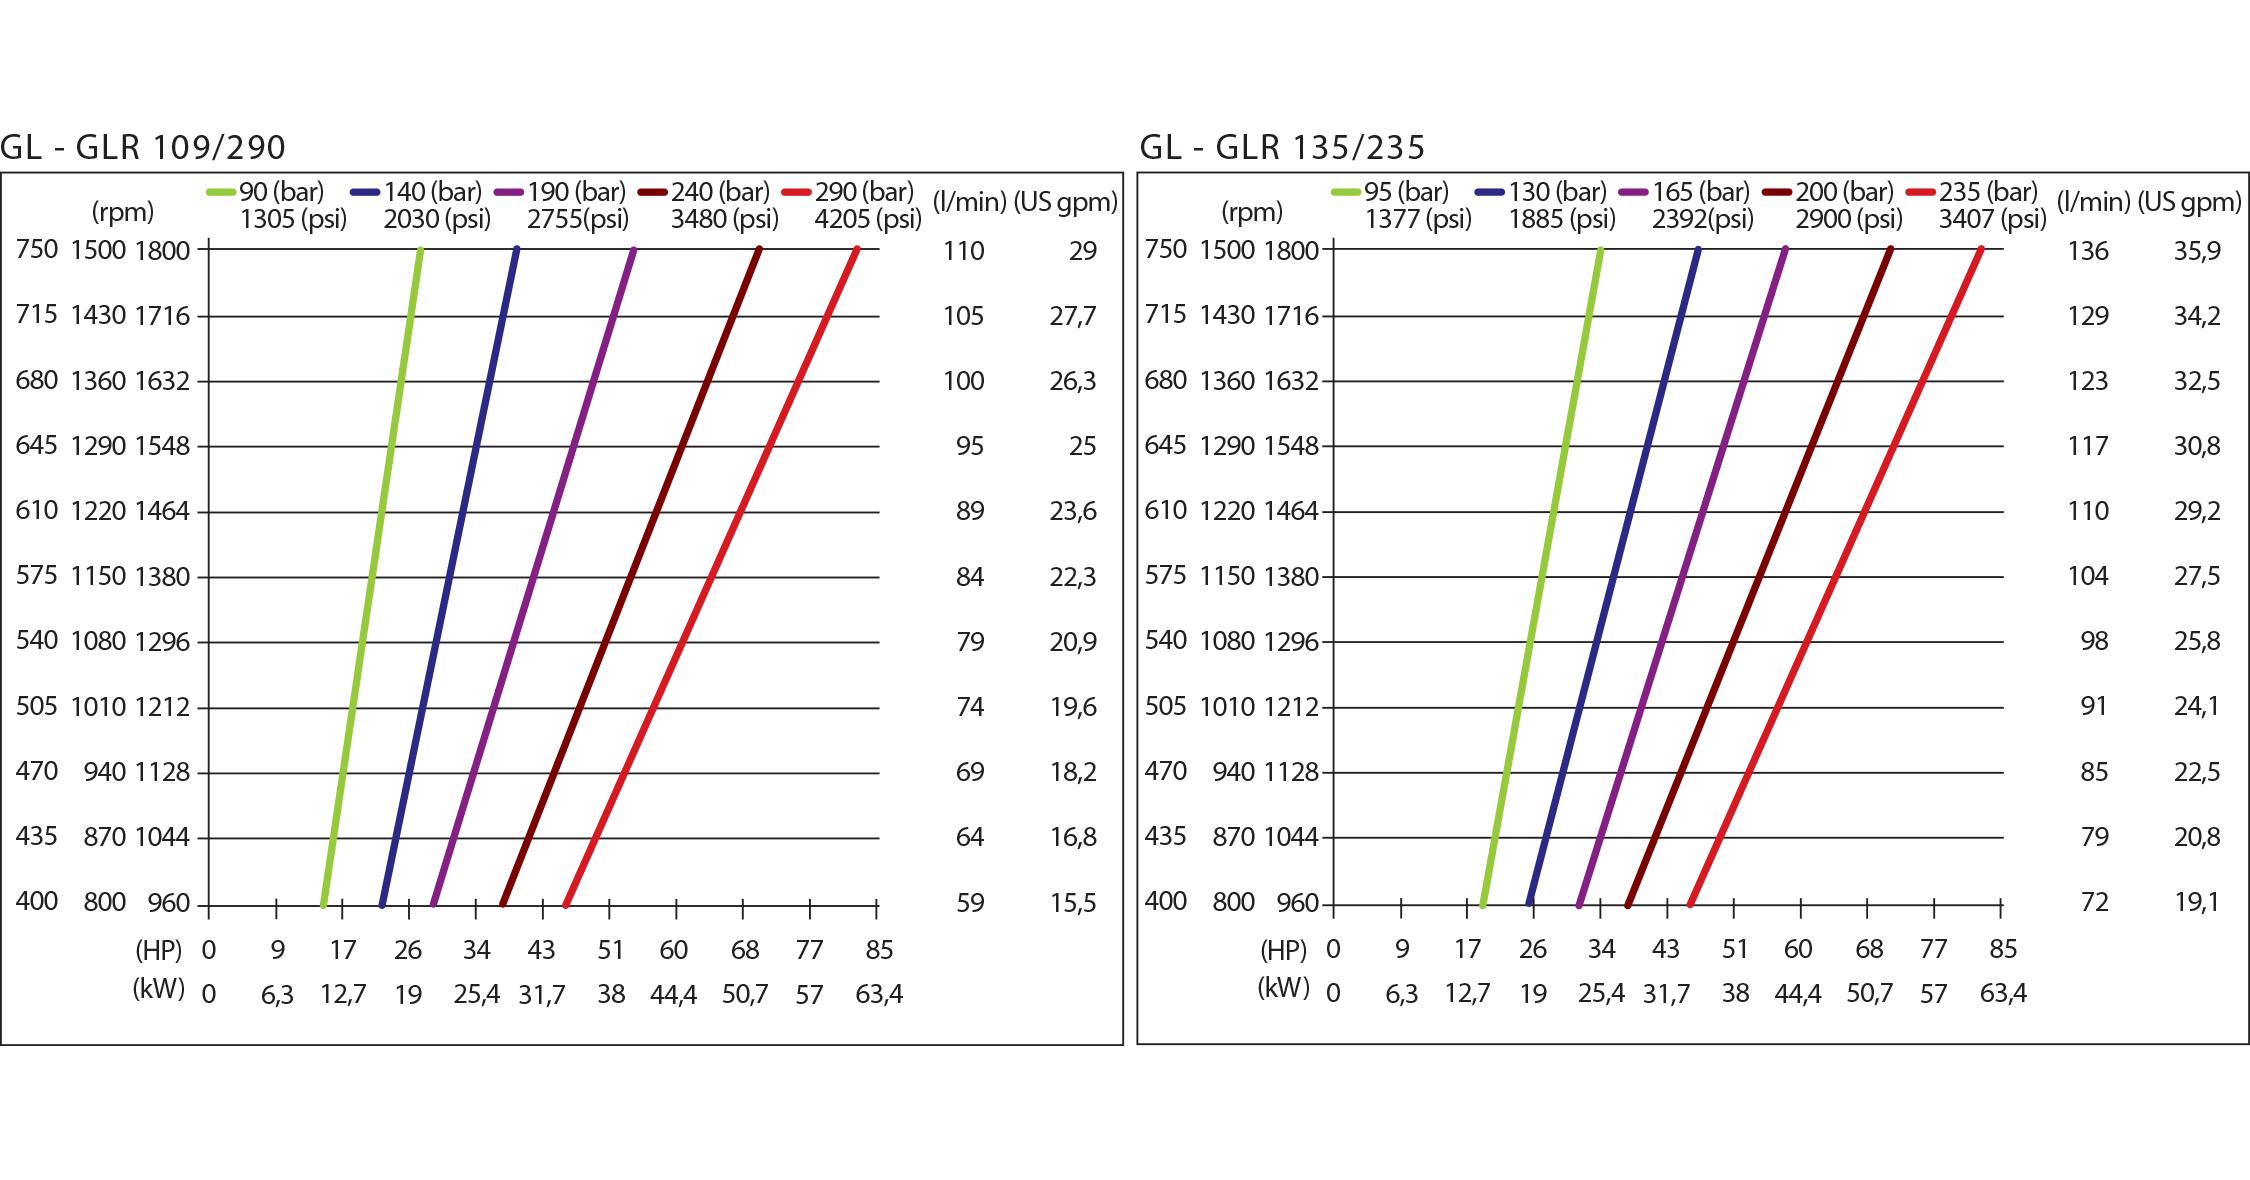 chart gl_glr hpp